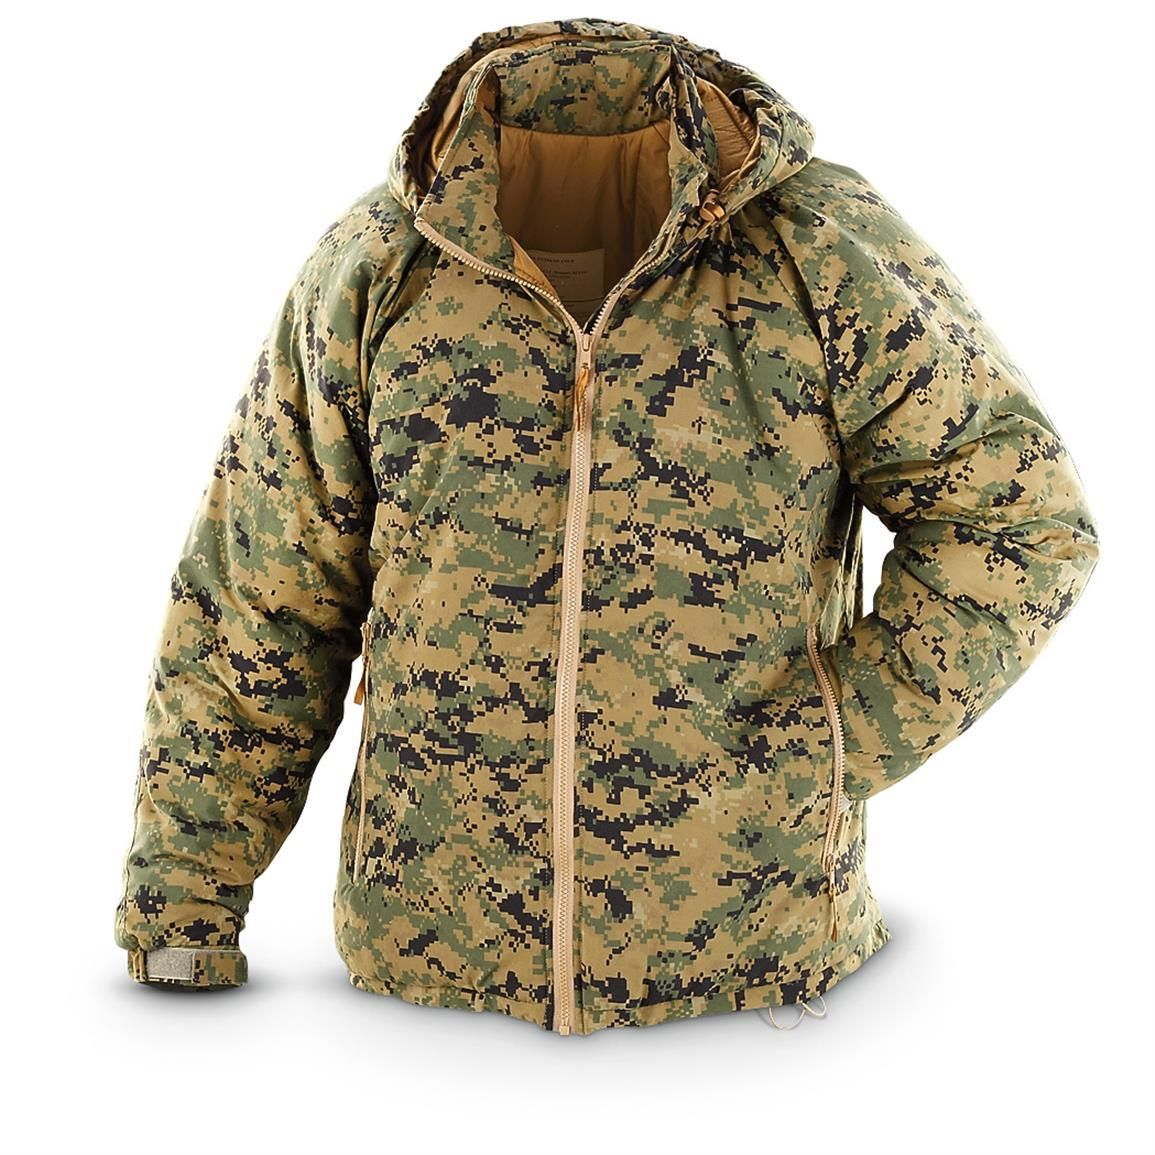 New U.S. Military Surplus Marpat Level 7 ECW Hooded Jacket ...